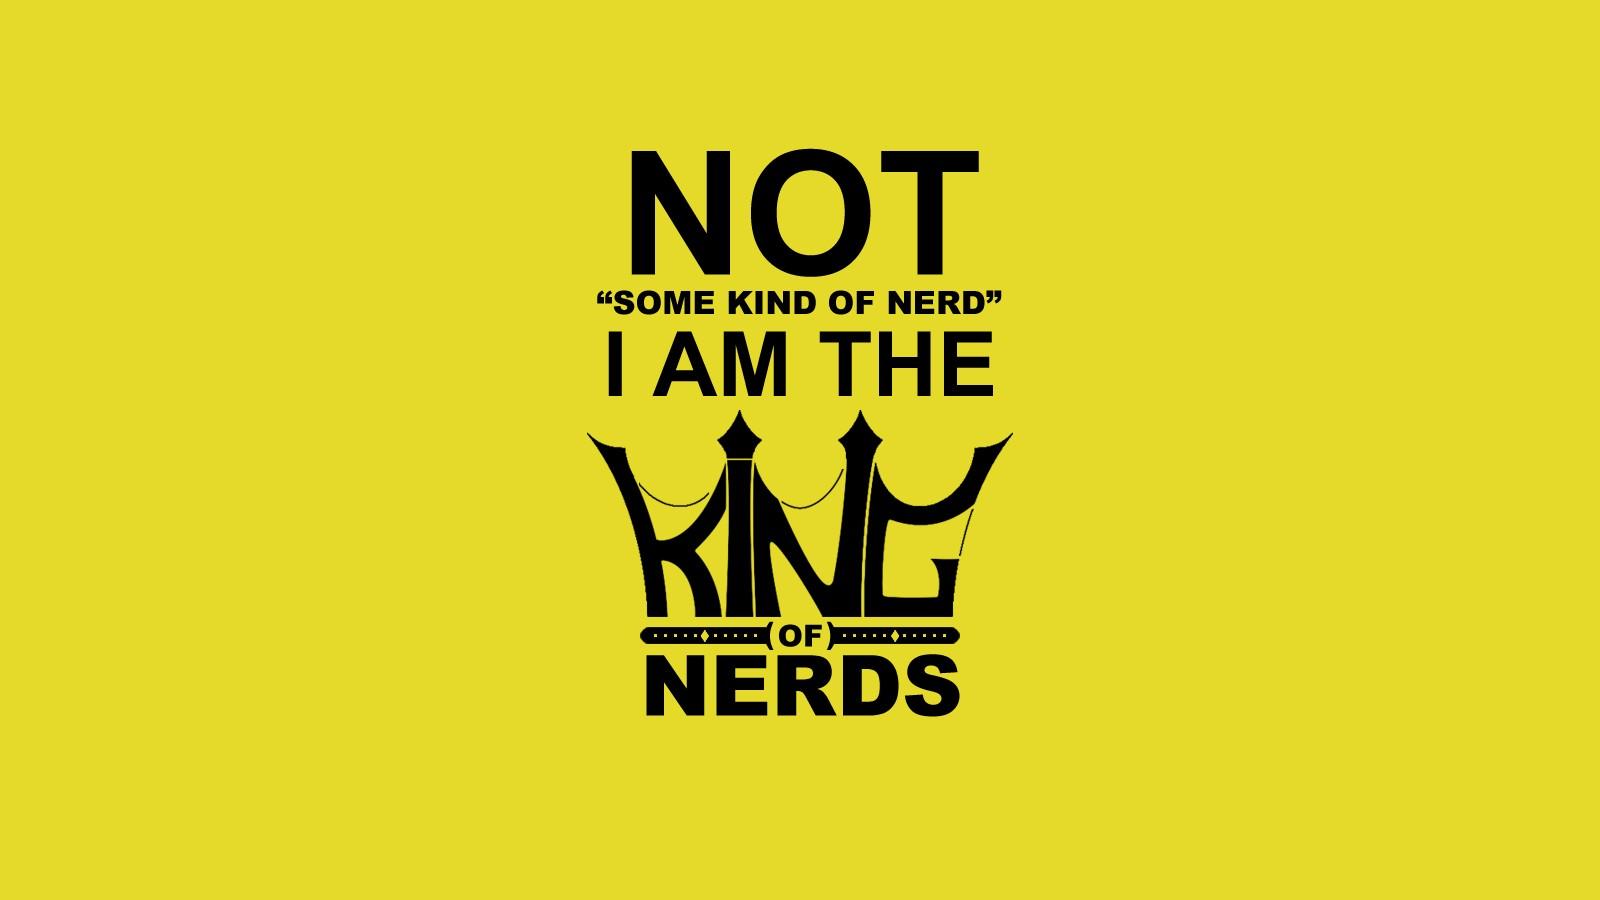 Nerd quote #4